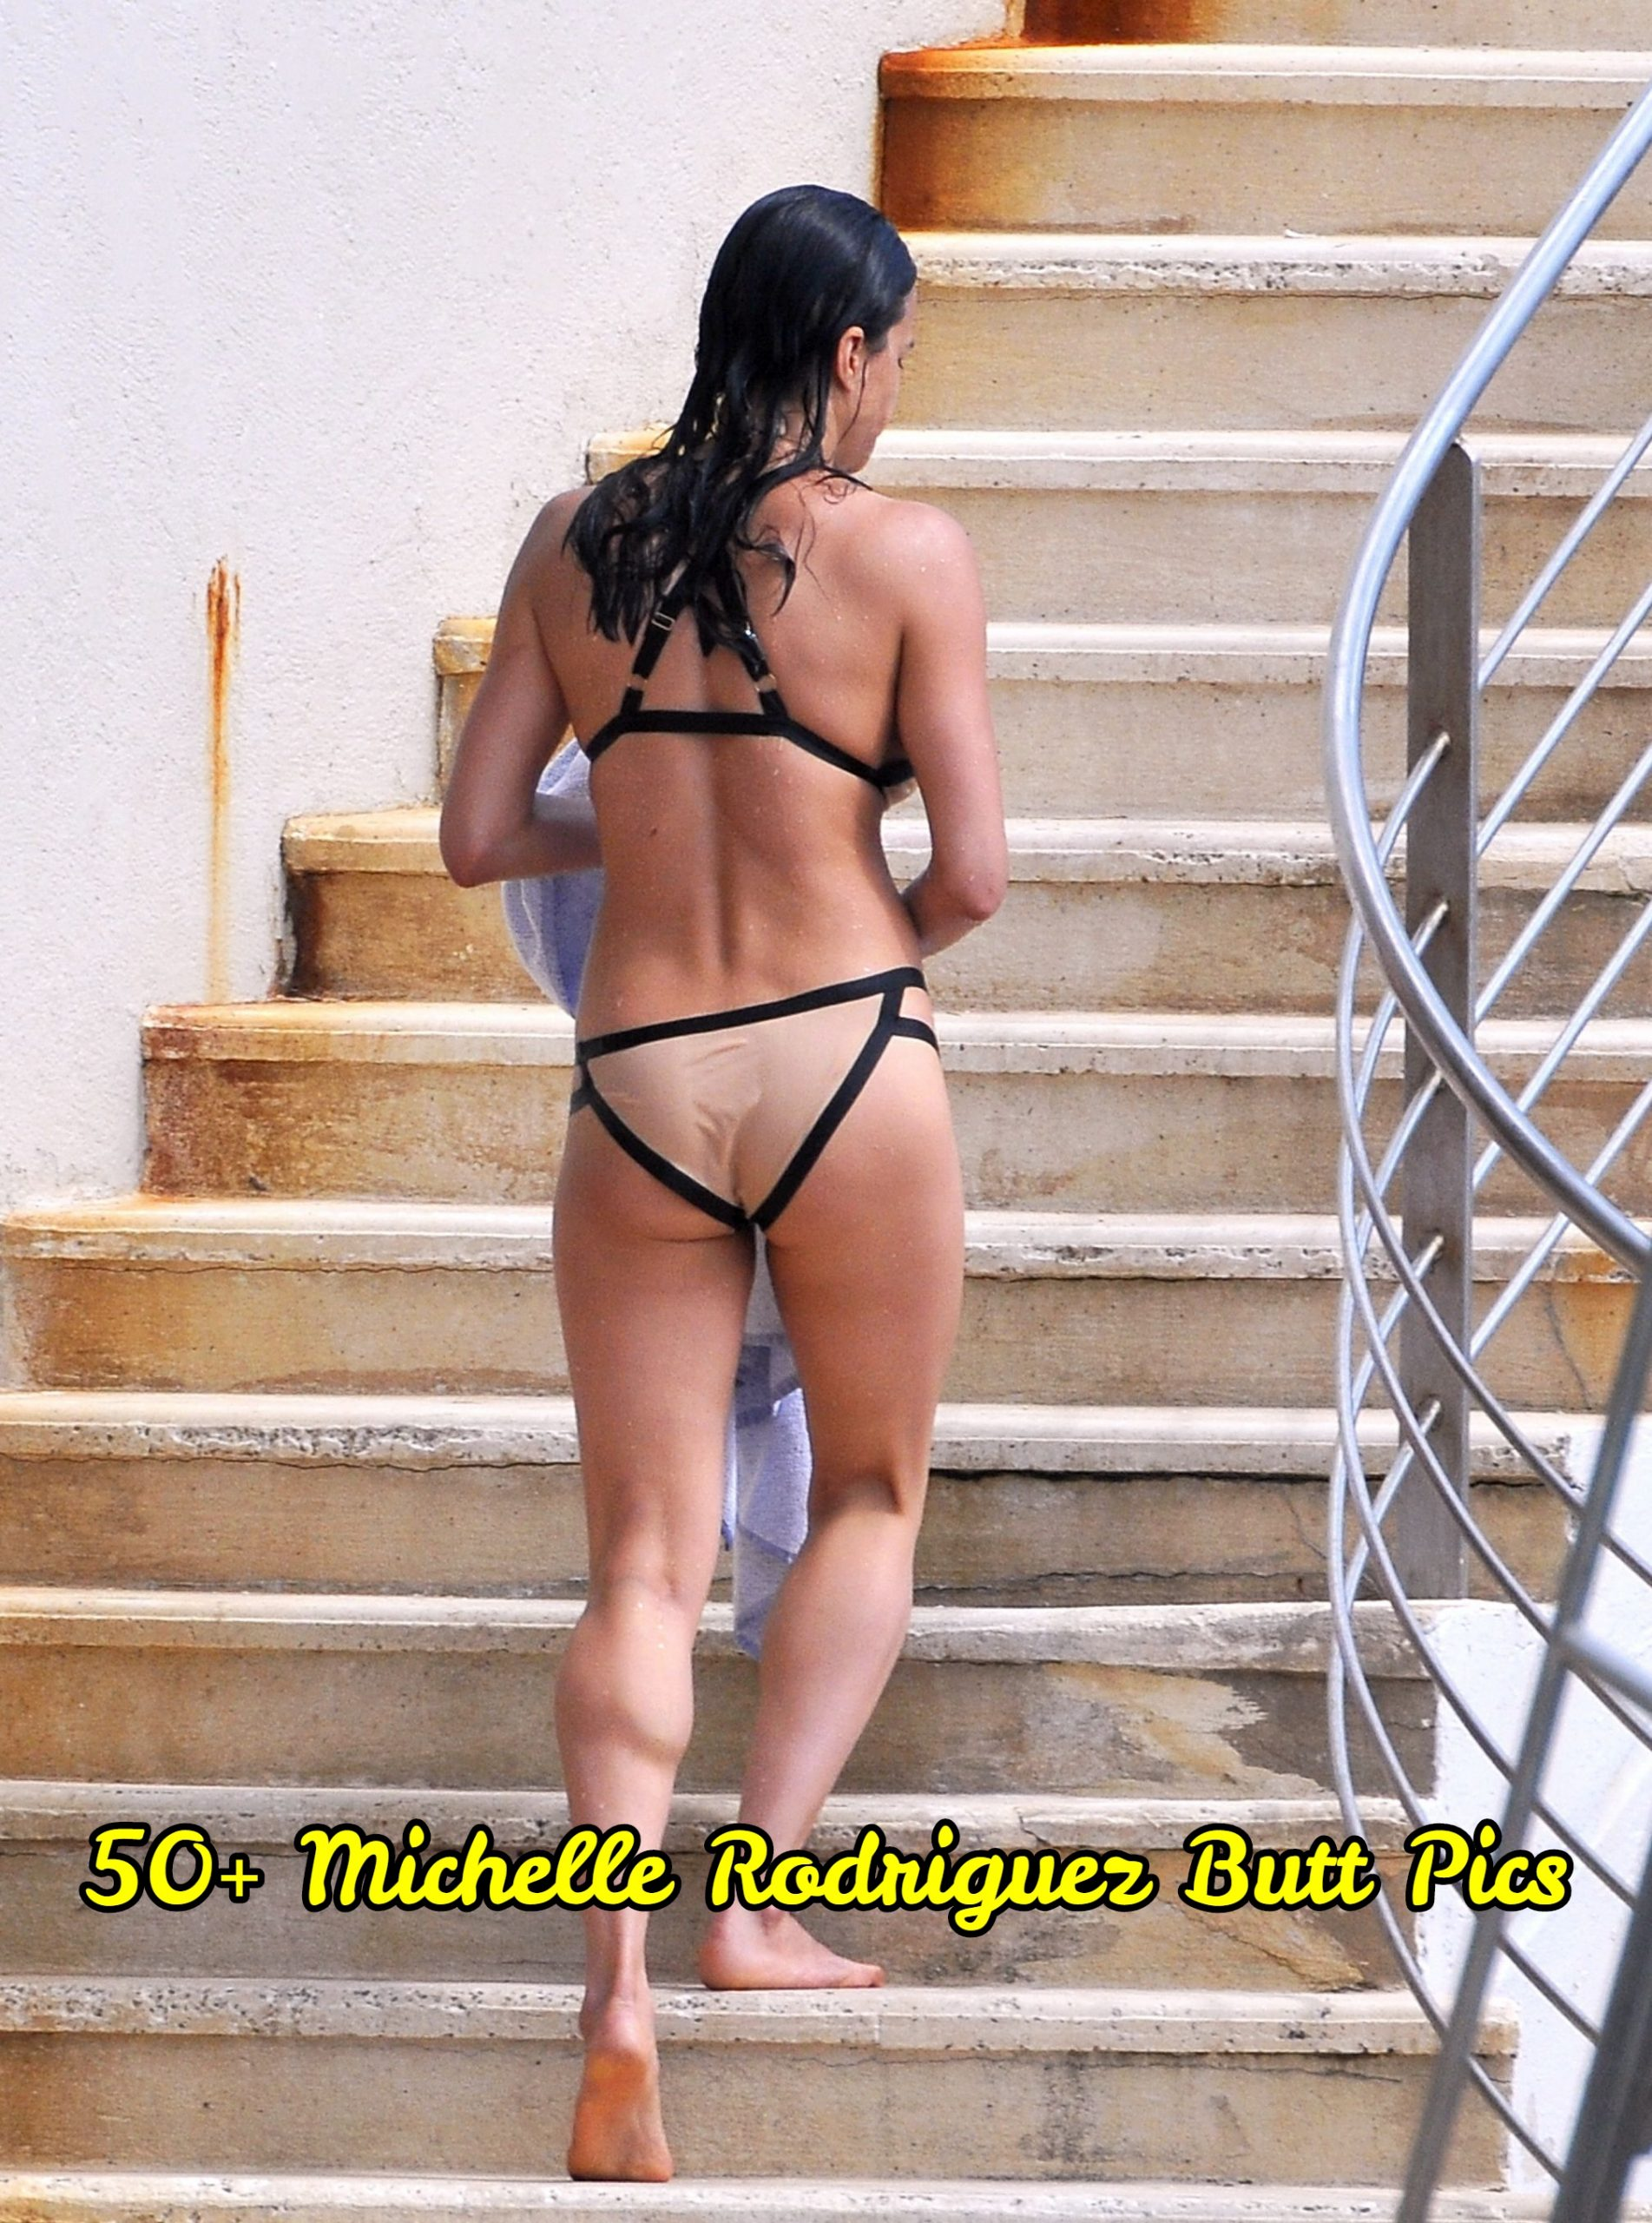 Michelle Rodriguez butt pics.